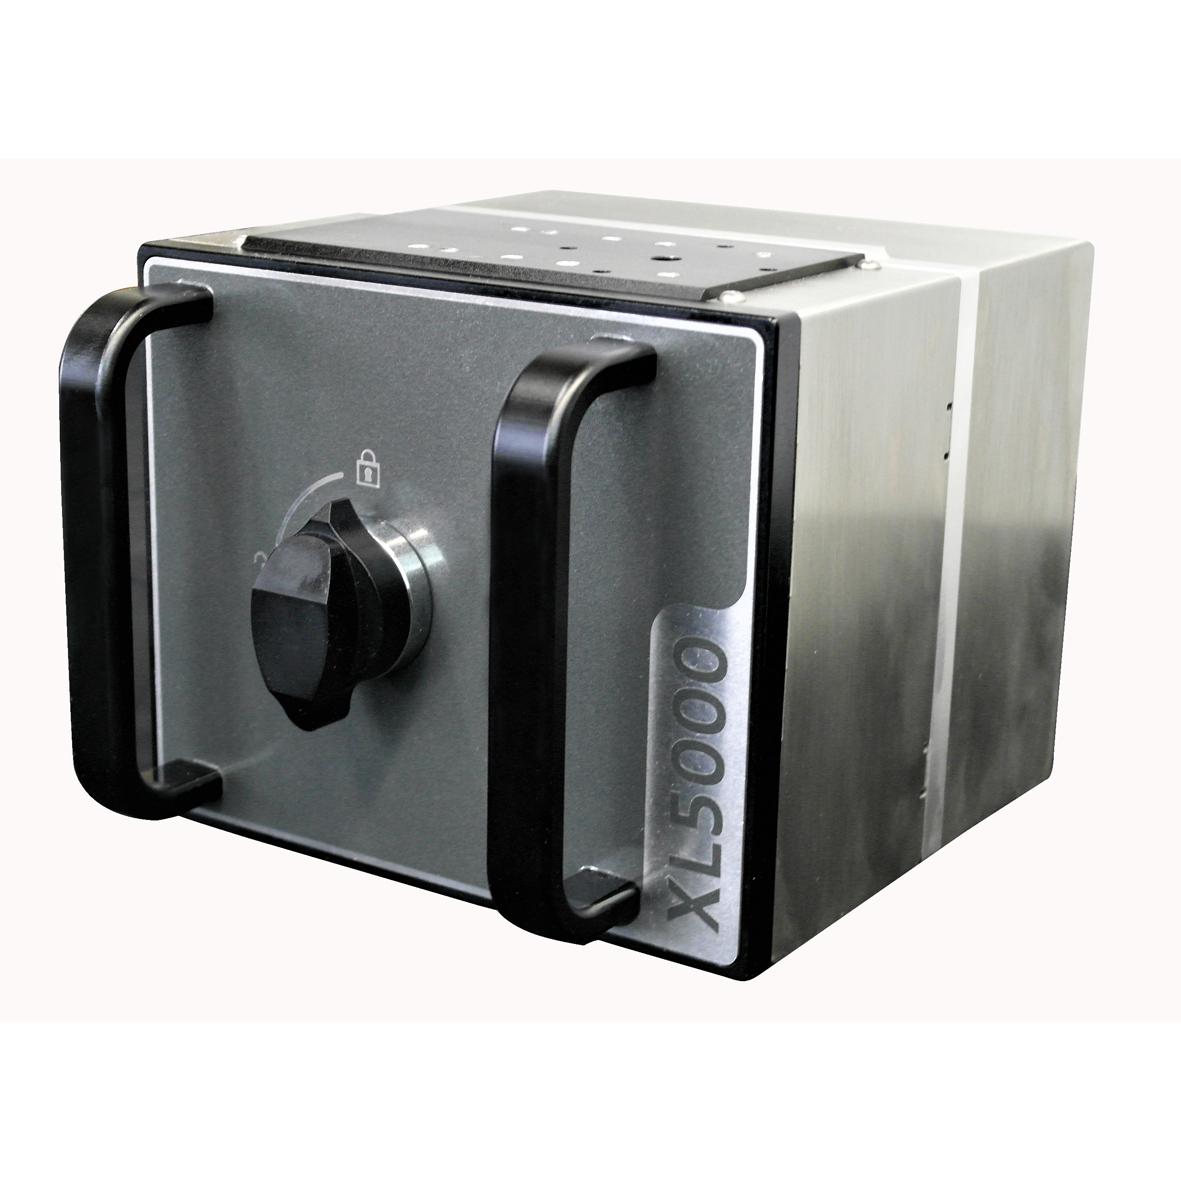 XL5000 impresora transferencia termica